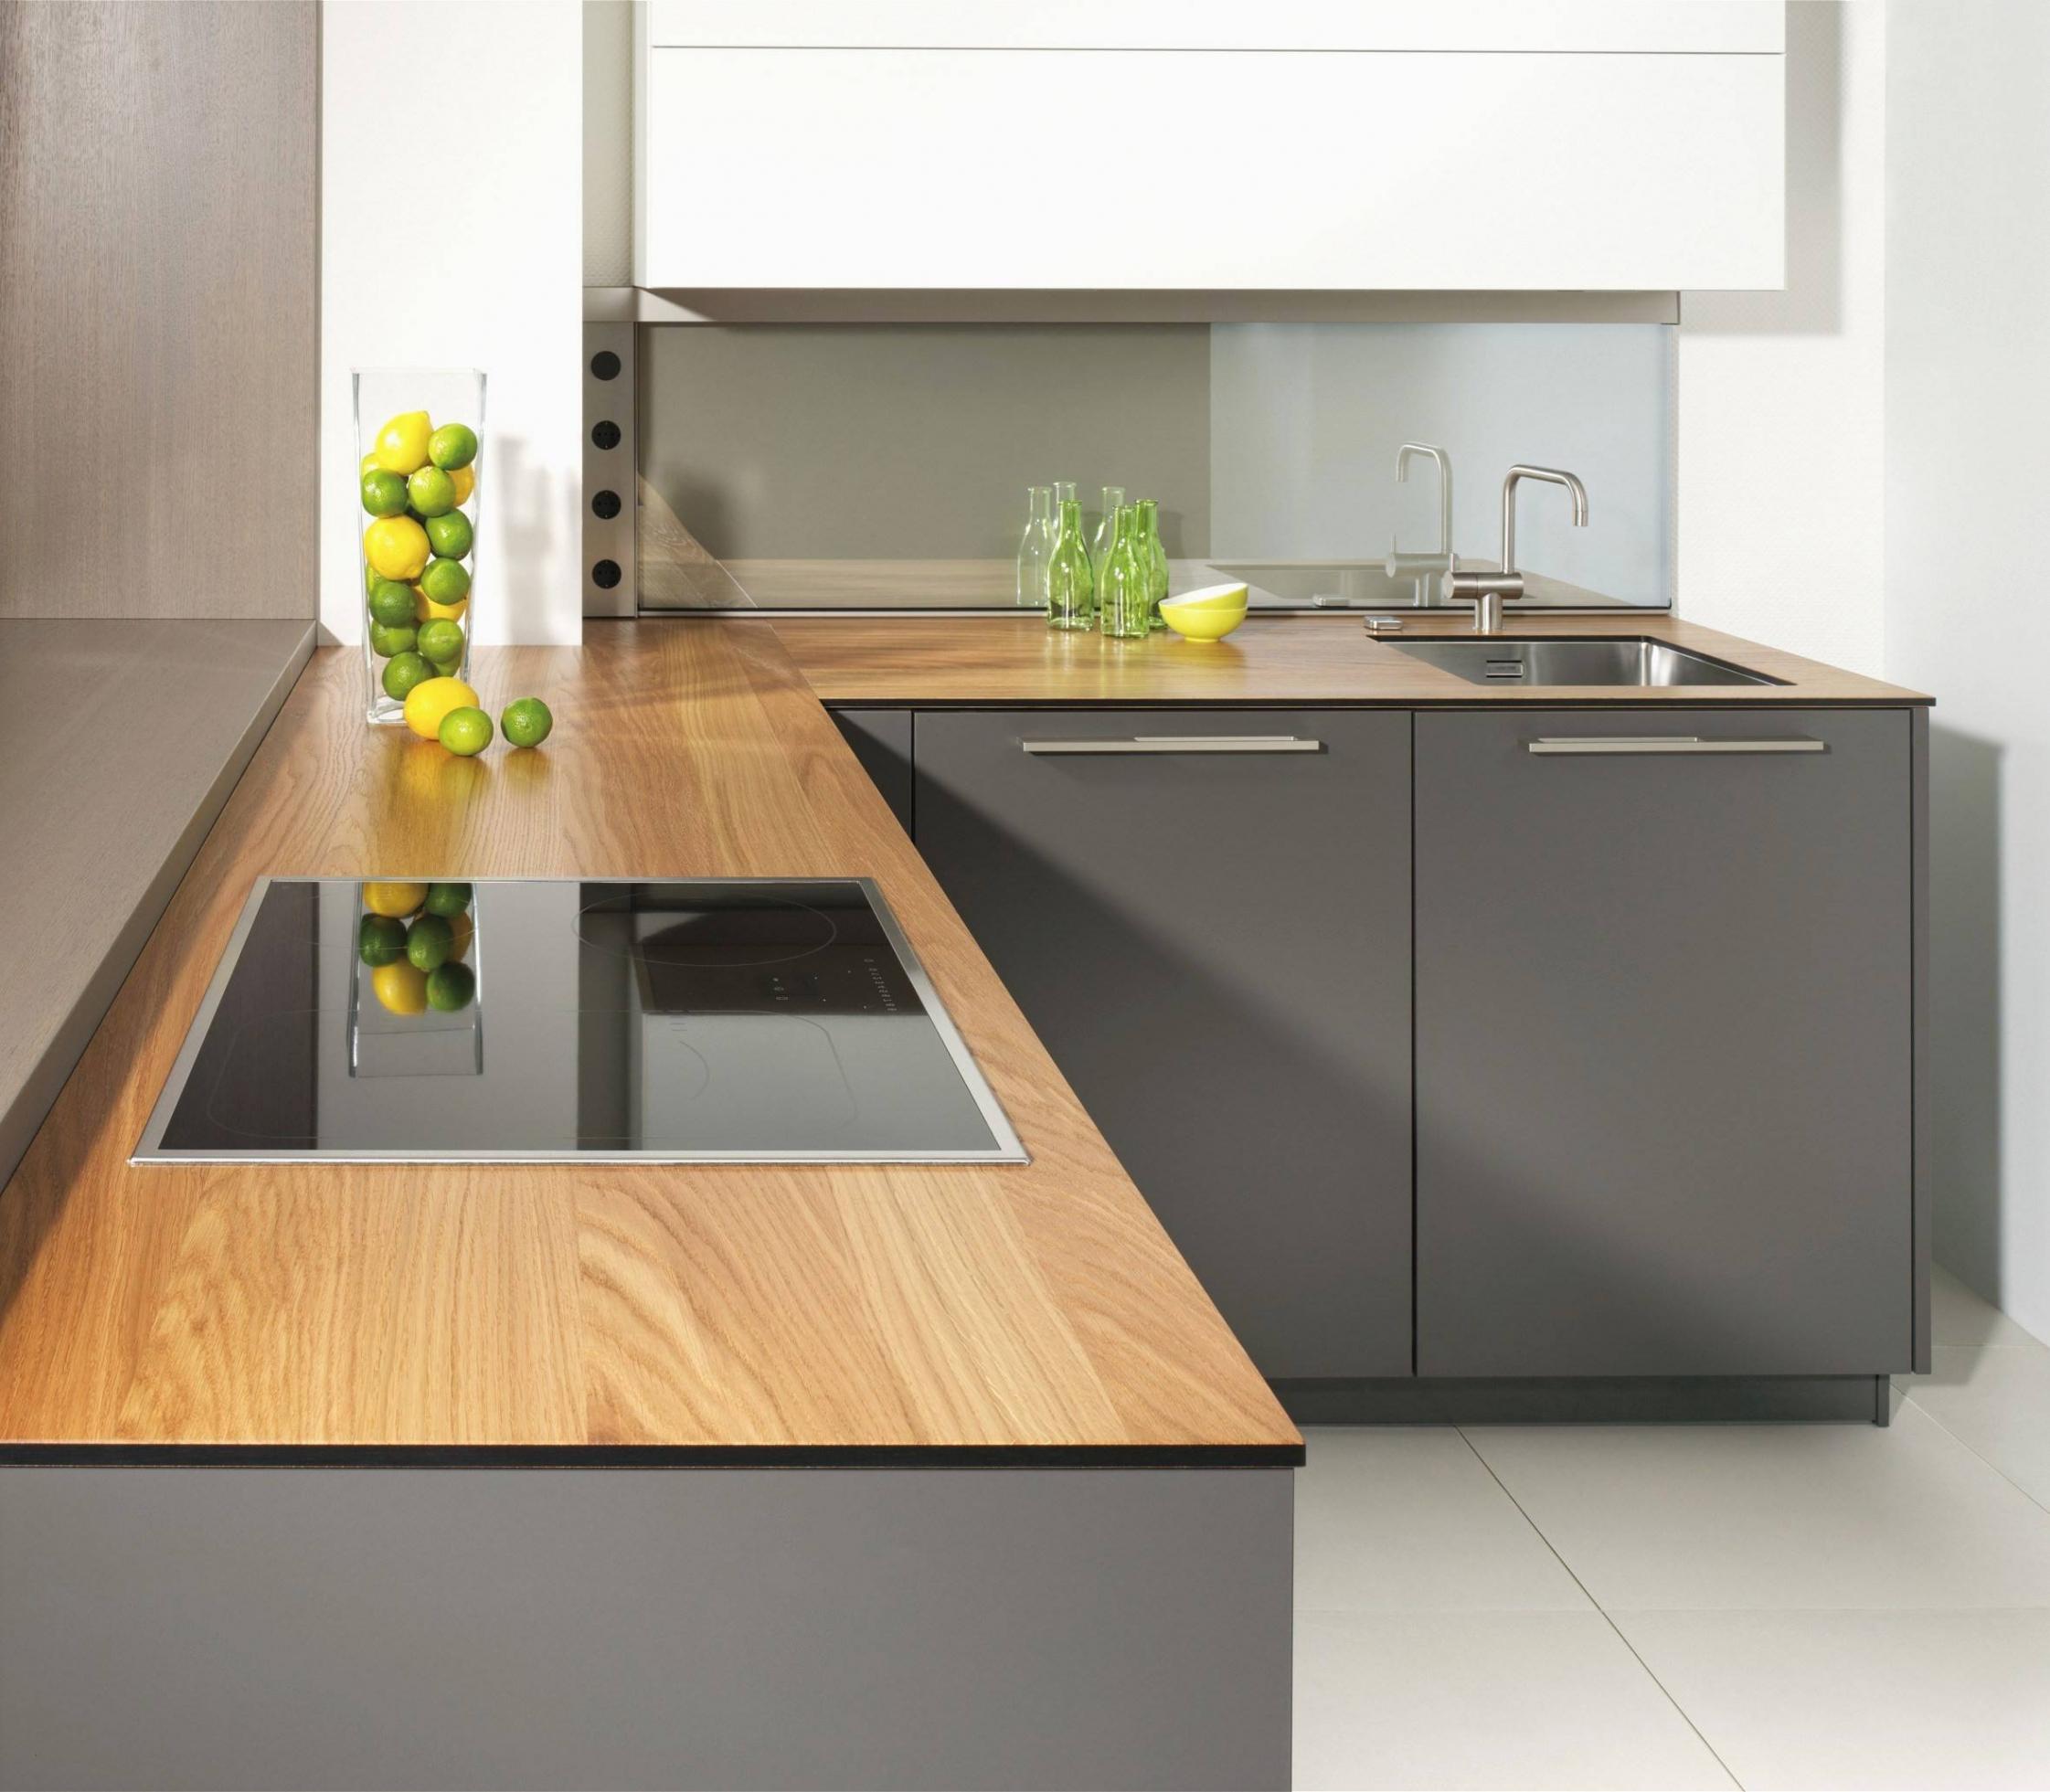 Full Size of Einzigartig Genial Eckbank Küche Modern Tbpmindset Planen Beste   Küche Richtig Planen Küche Küche Planen